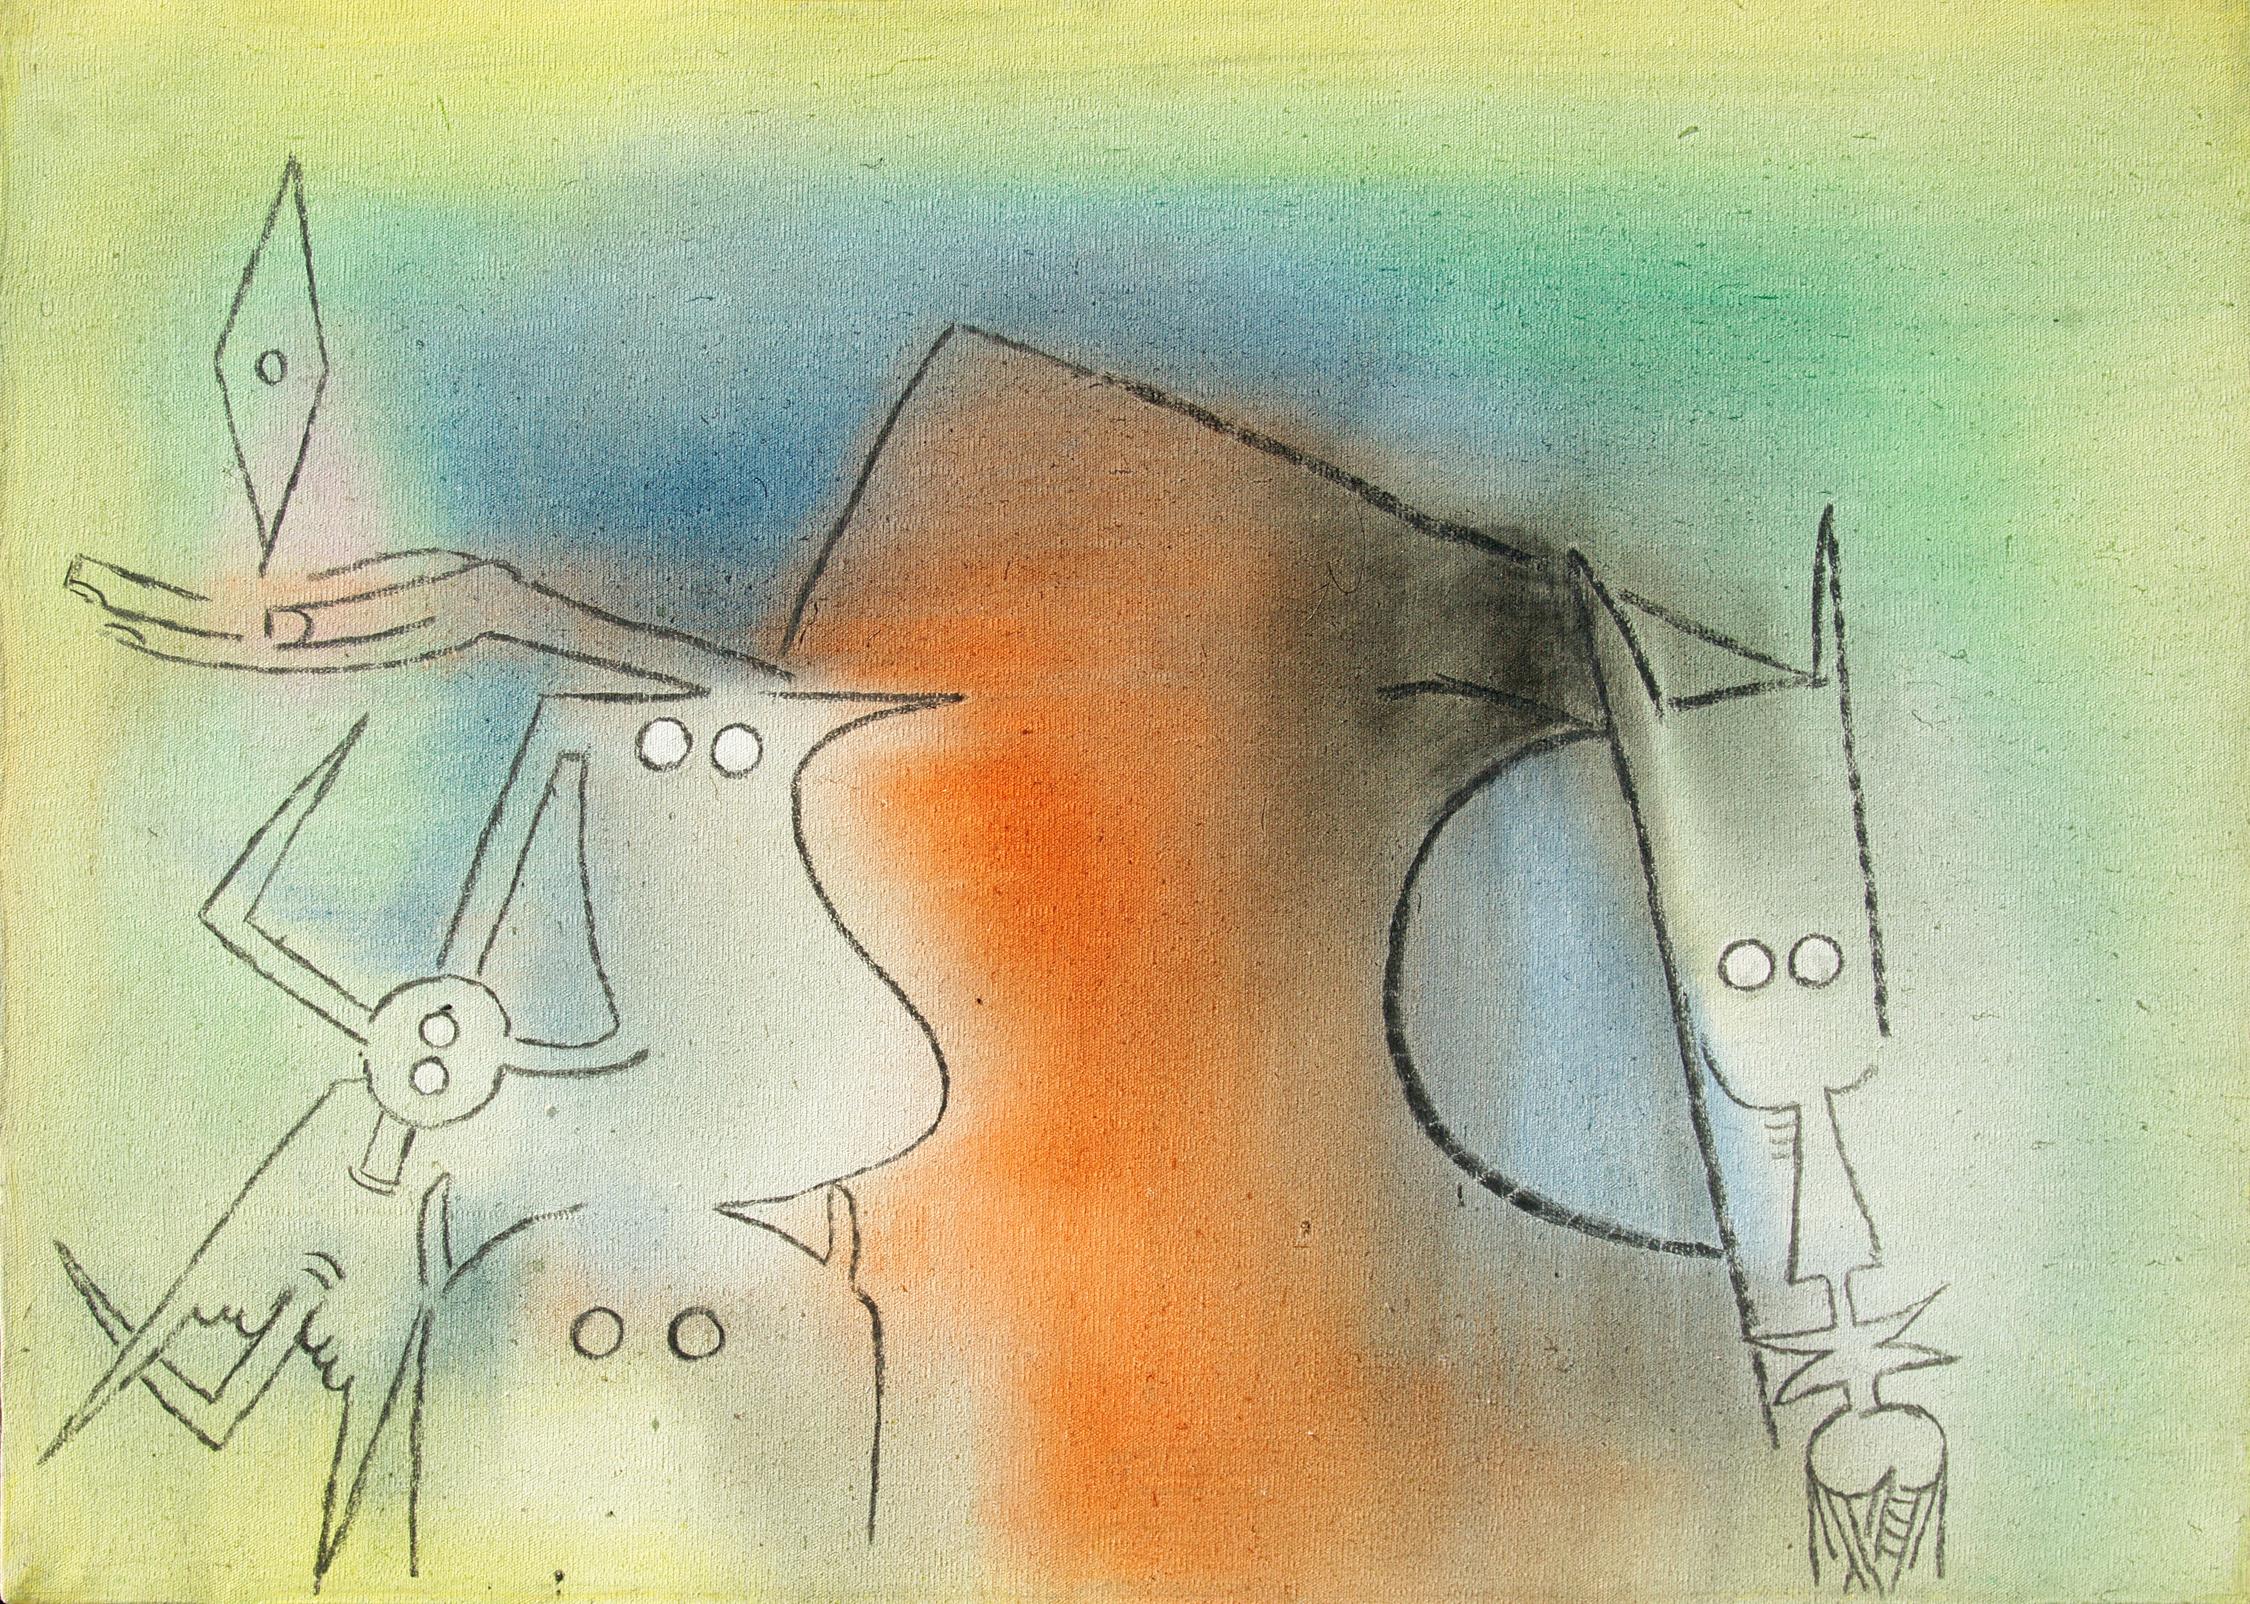 alt Untitled [Bird with Figures] (Sin Título [Pájaro con Figuras]